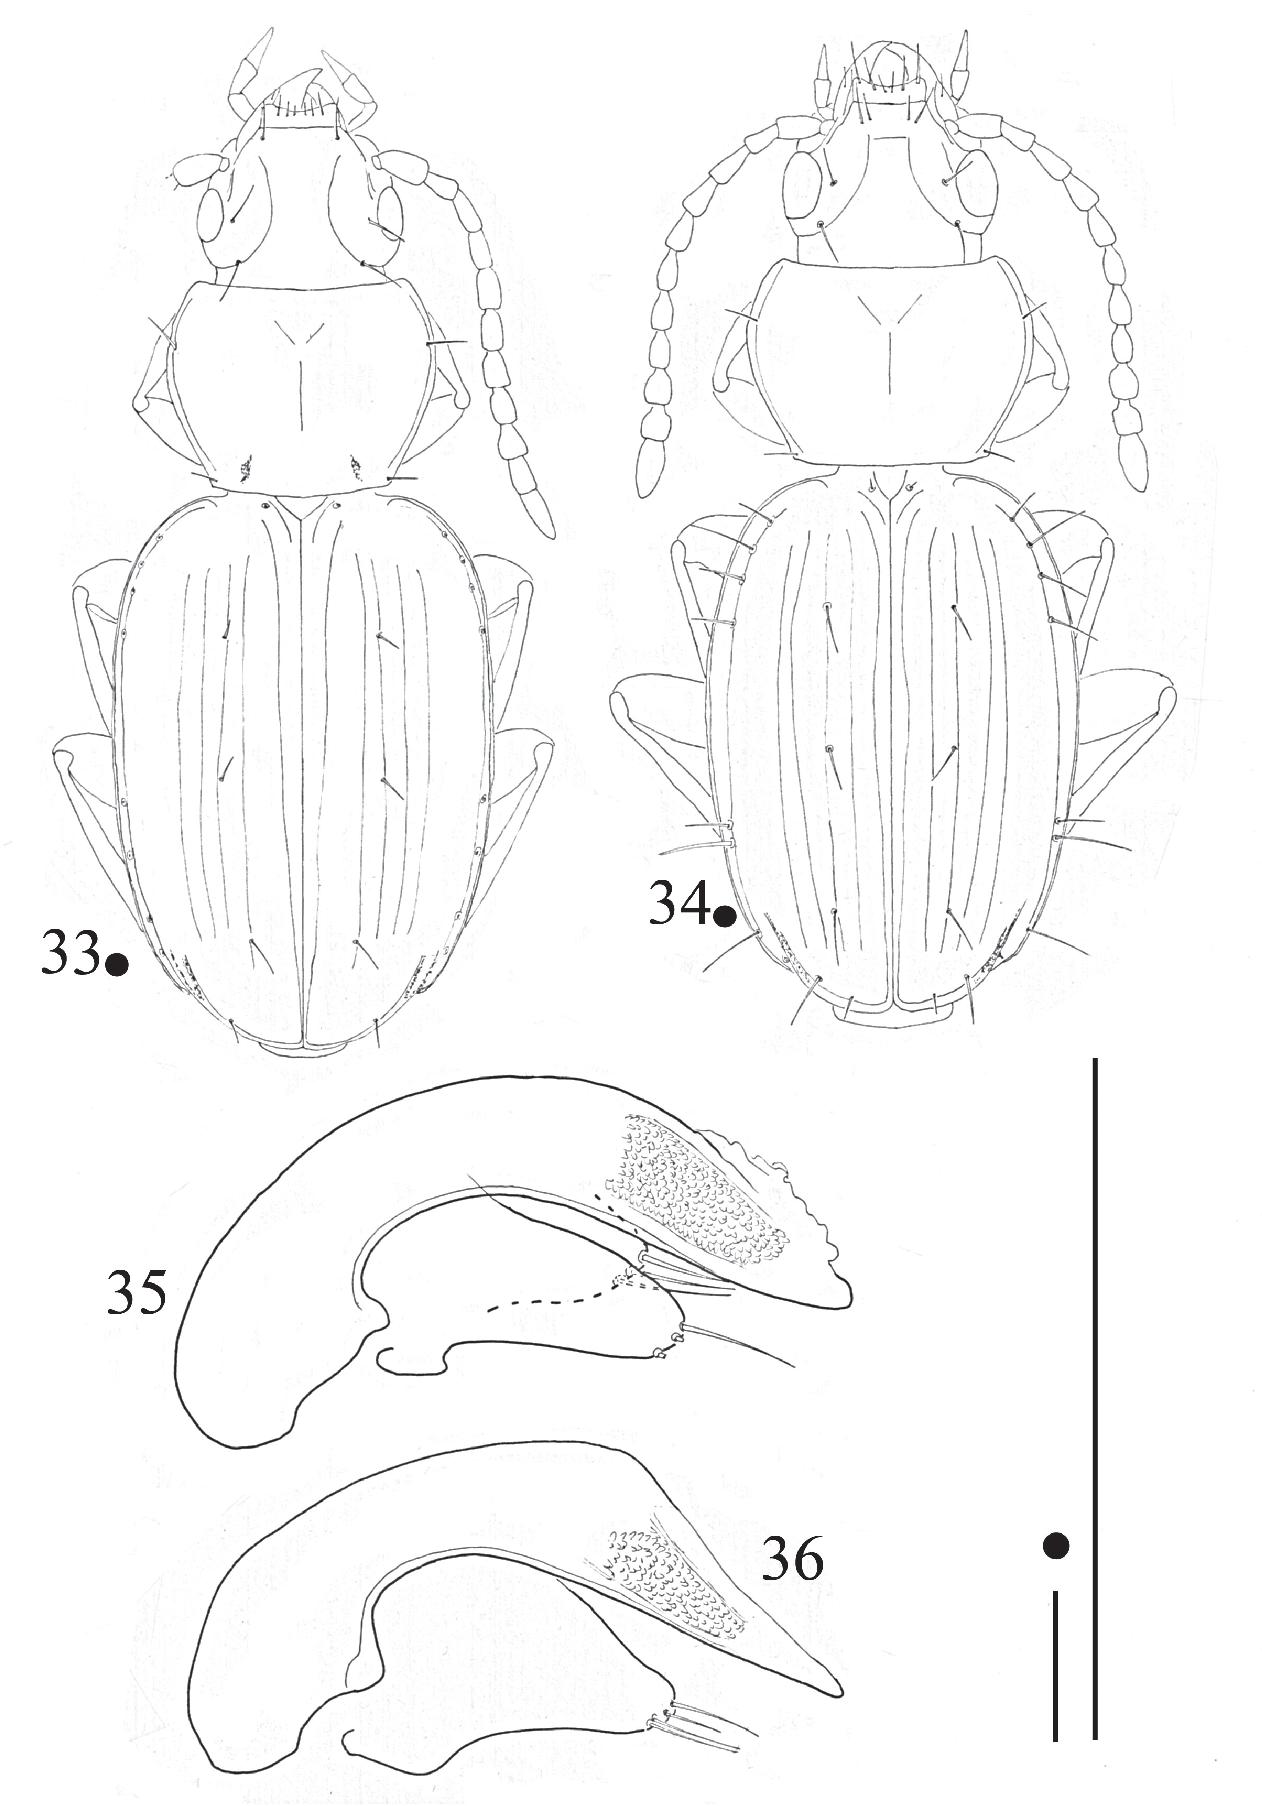 figure 33-36